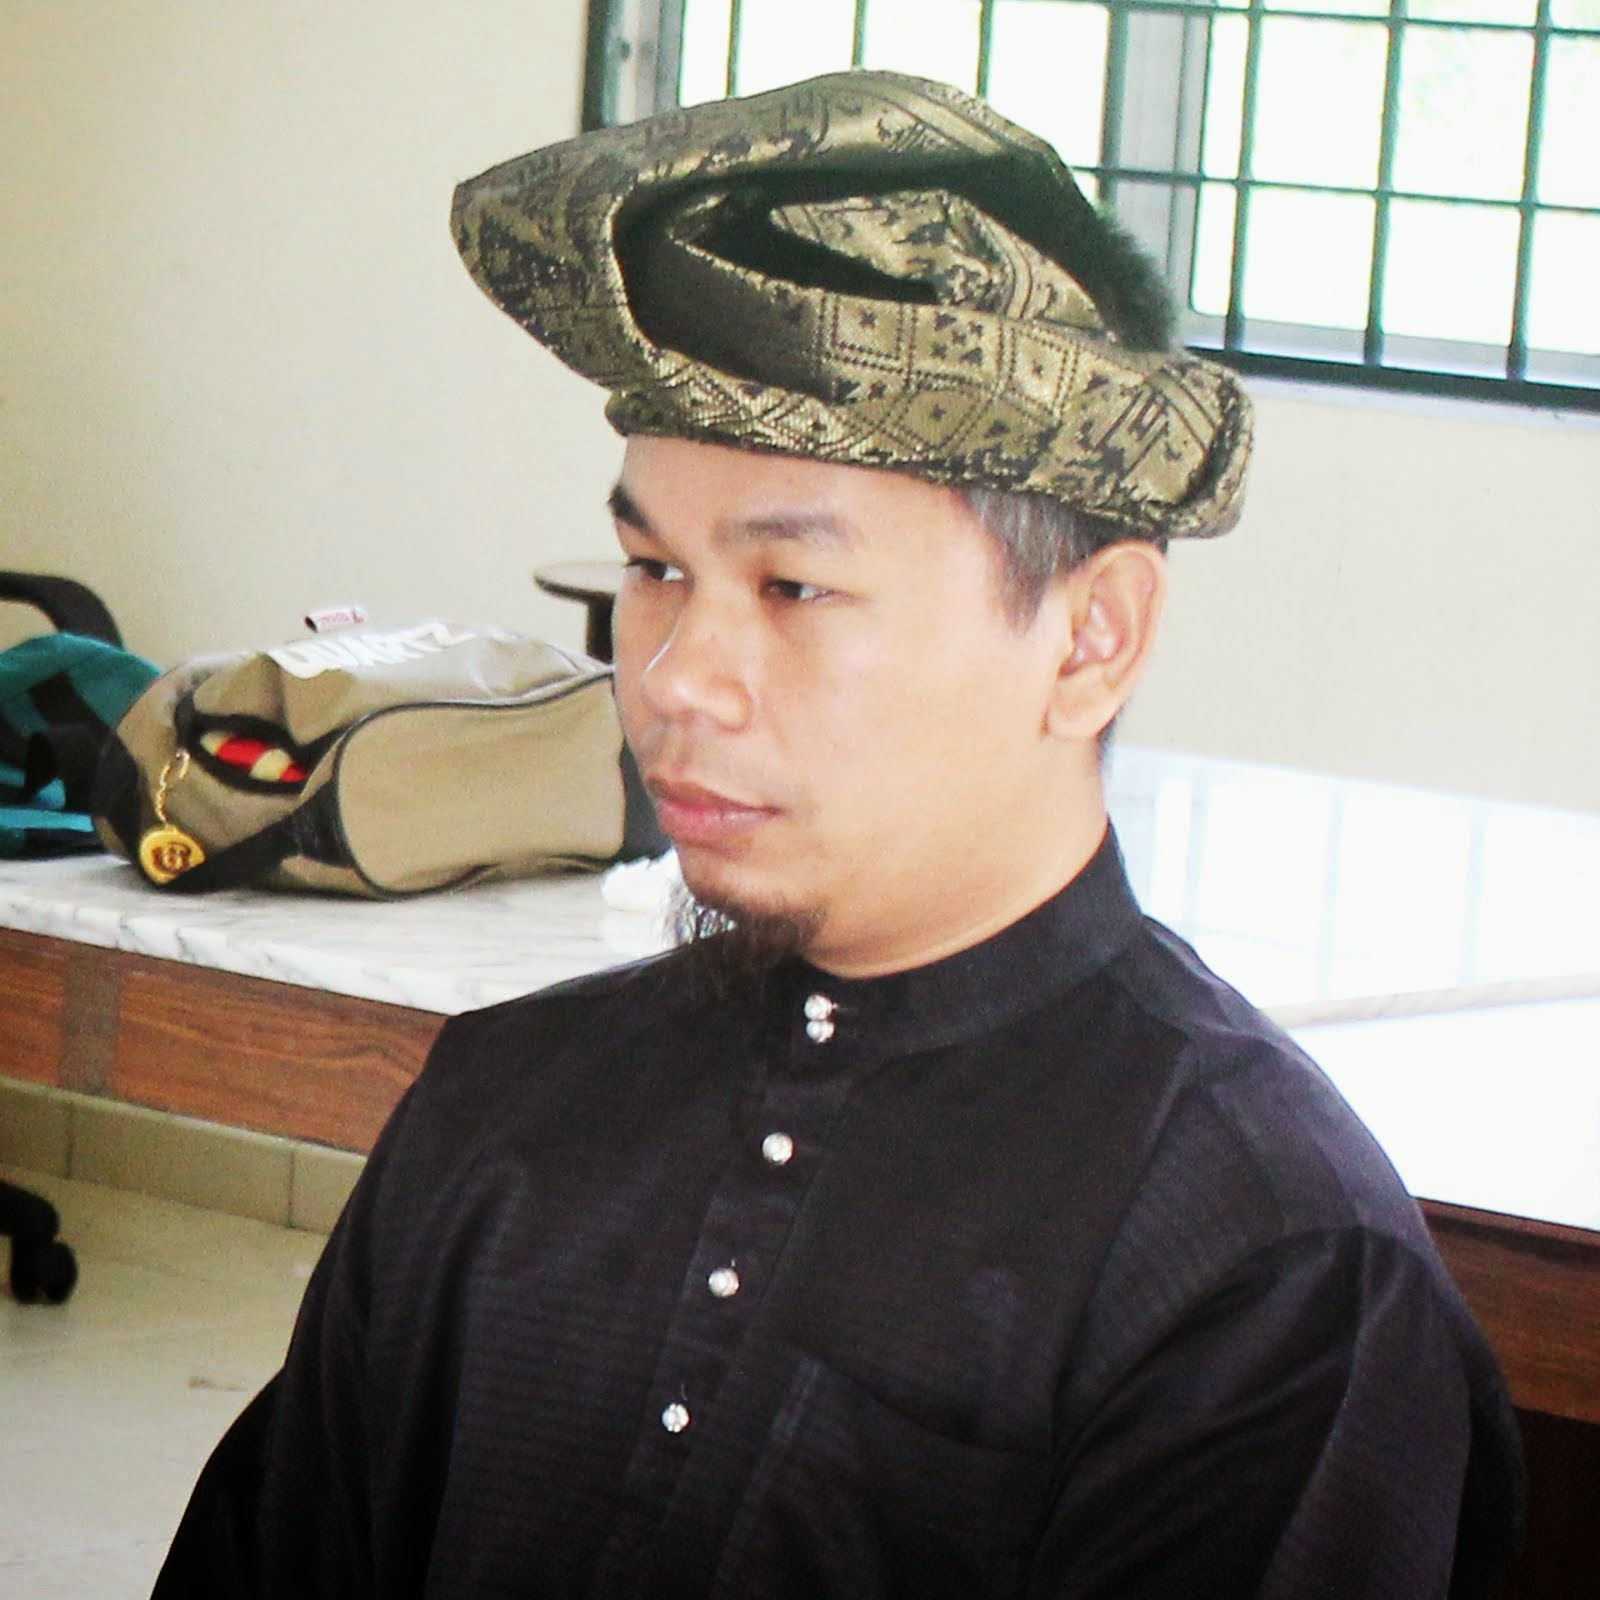 Yang Di-Pertua Pssgm Hulu Selangor